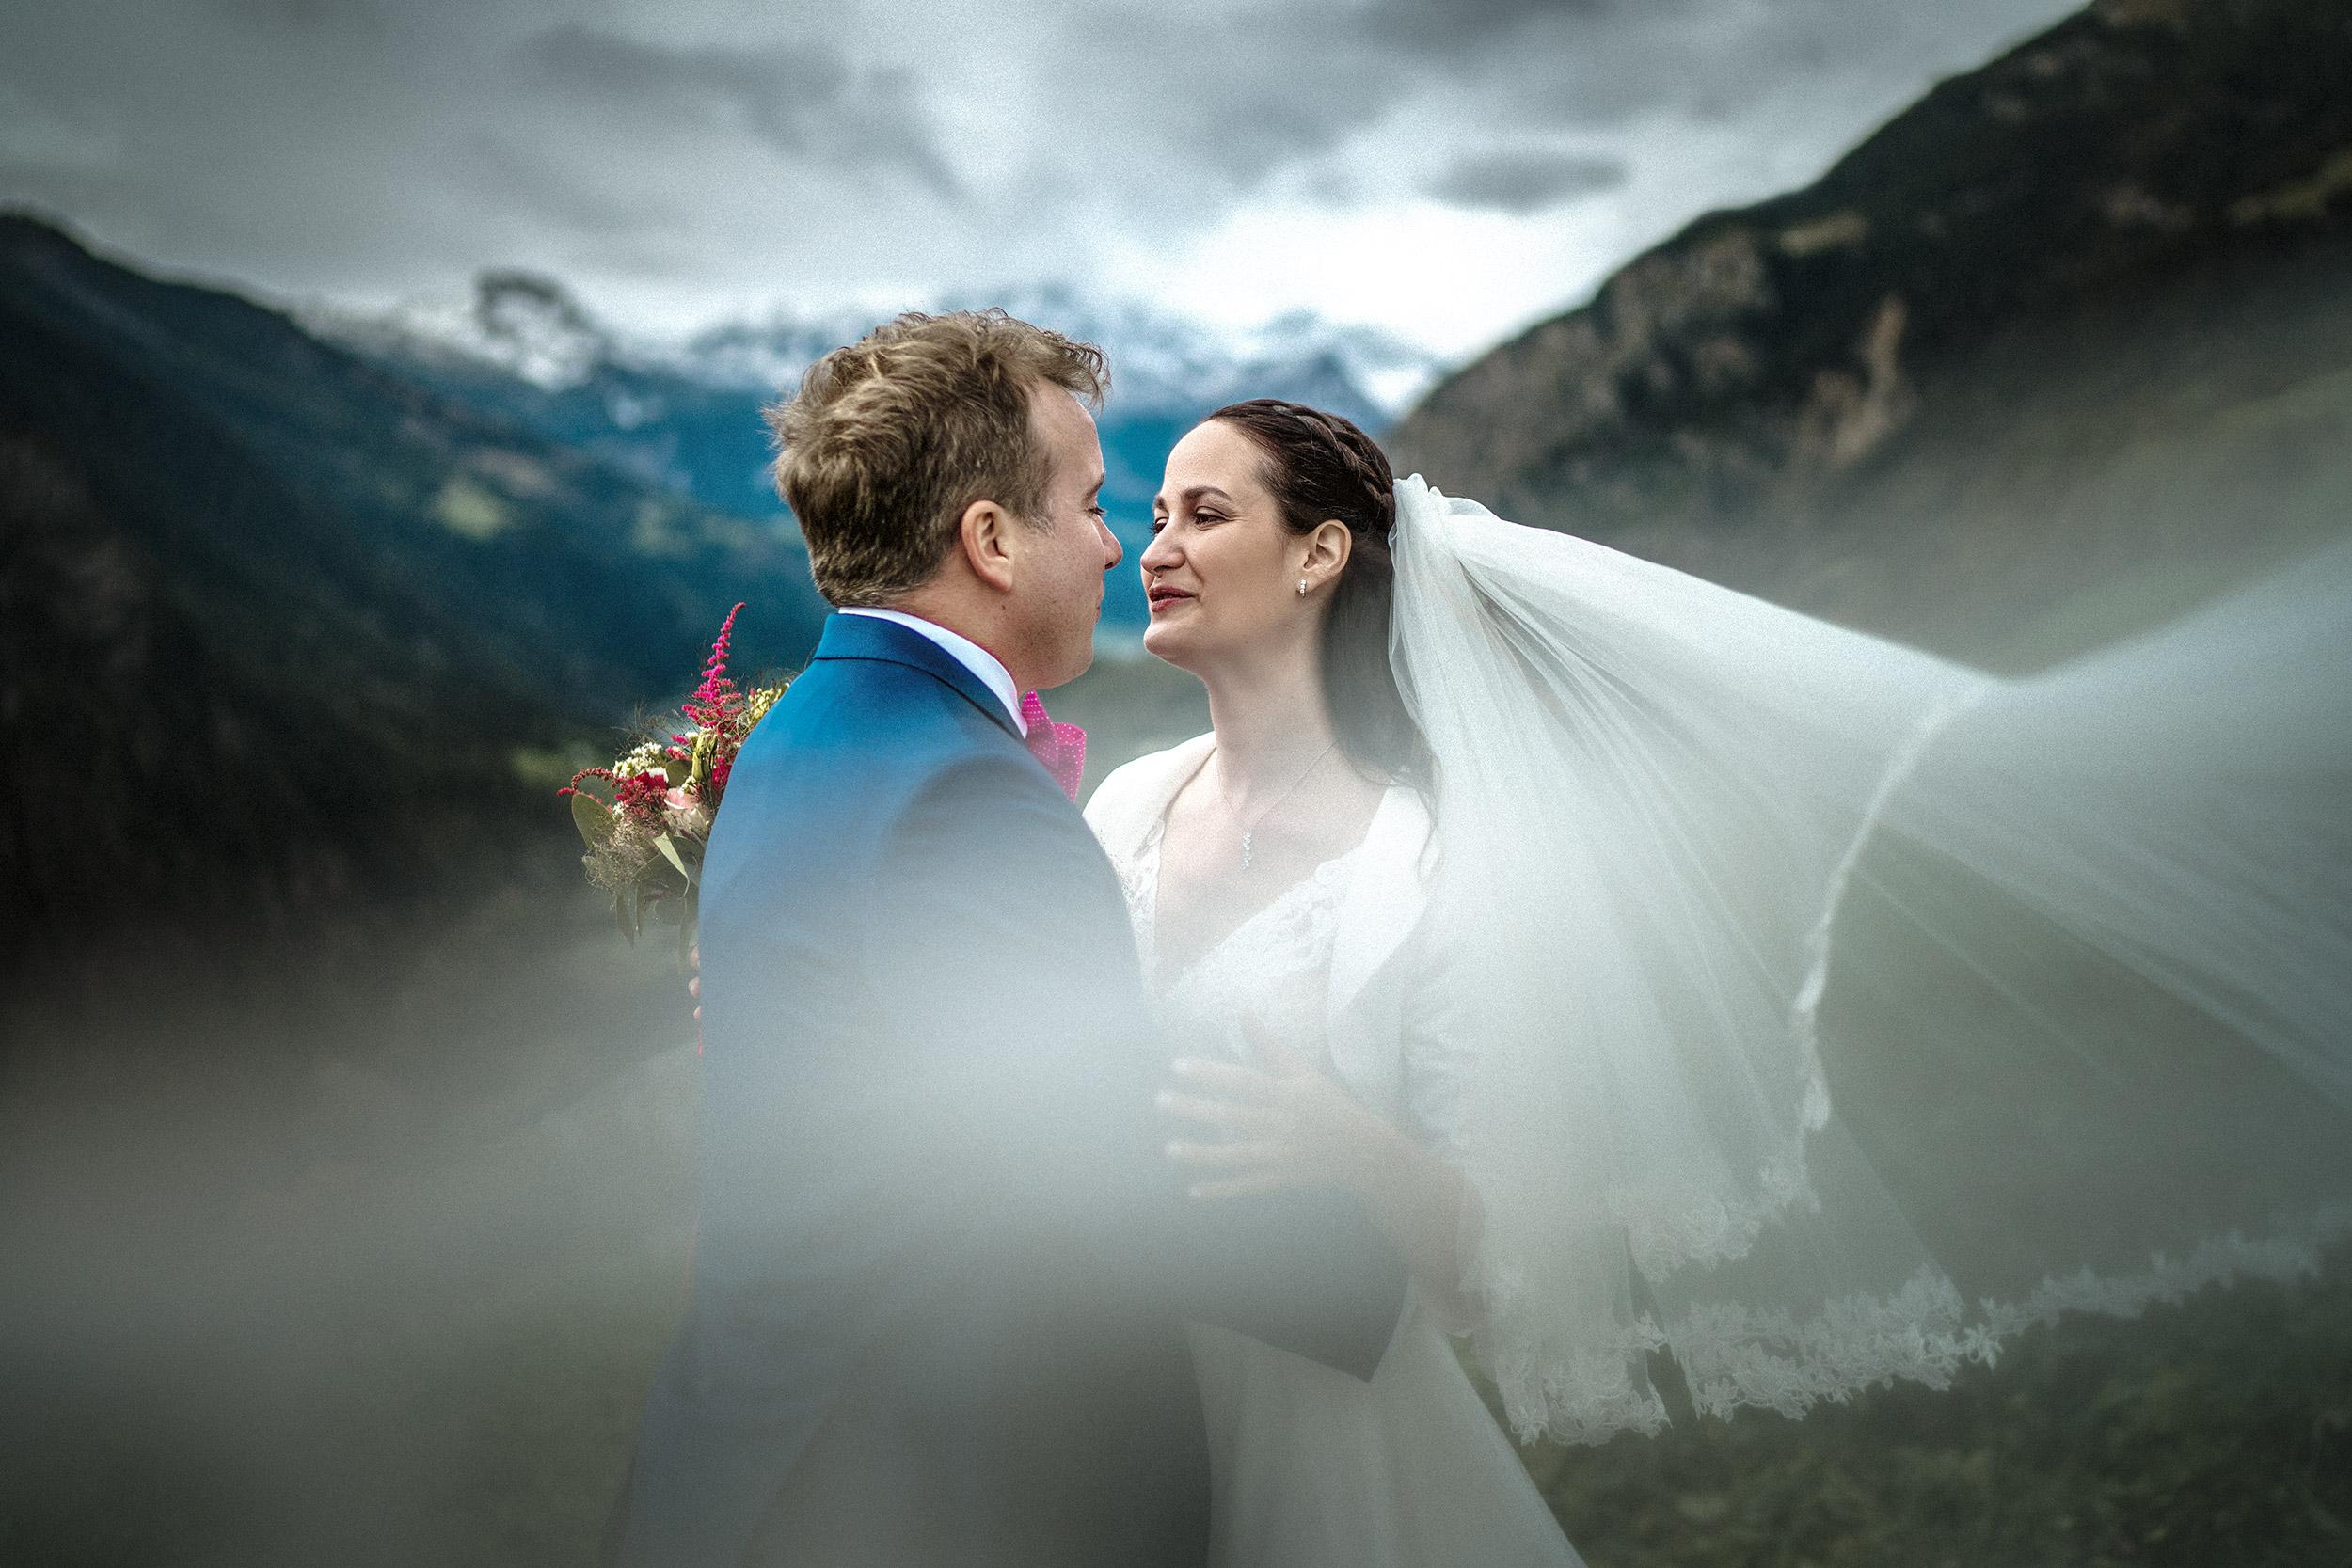 001 foto matrimonio reportage wedding poschiavo svizzera 1